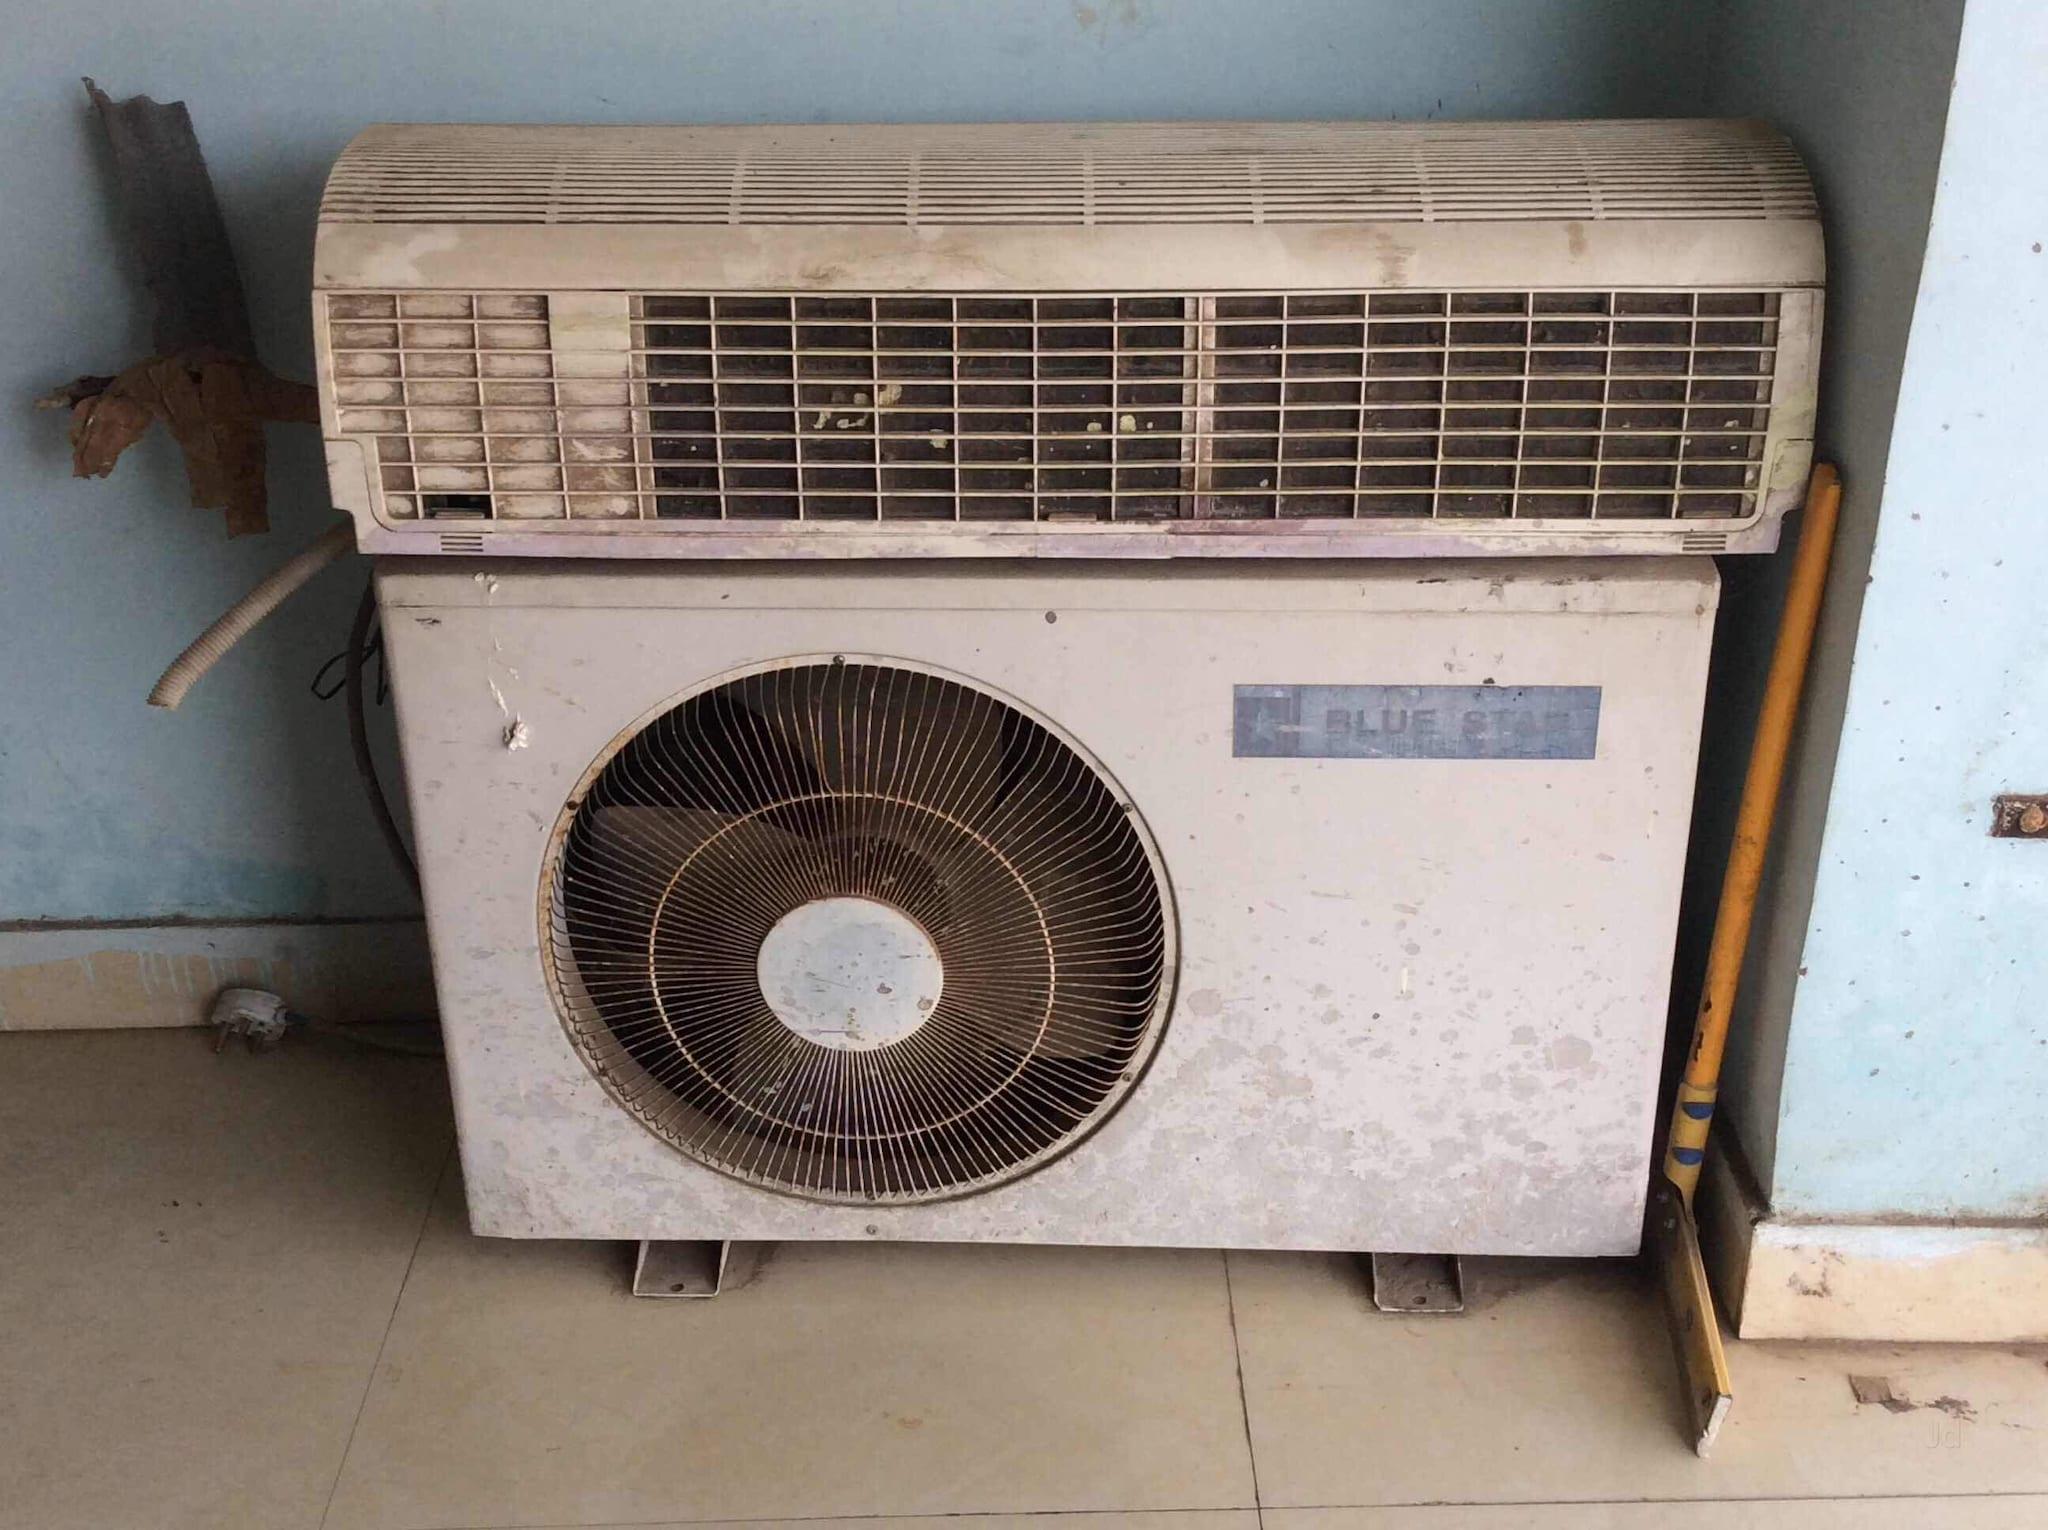 Top LG AC Repair & Services in Bhopal - Best LG AC Service